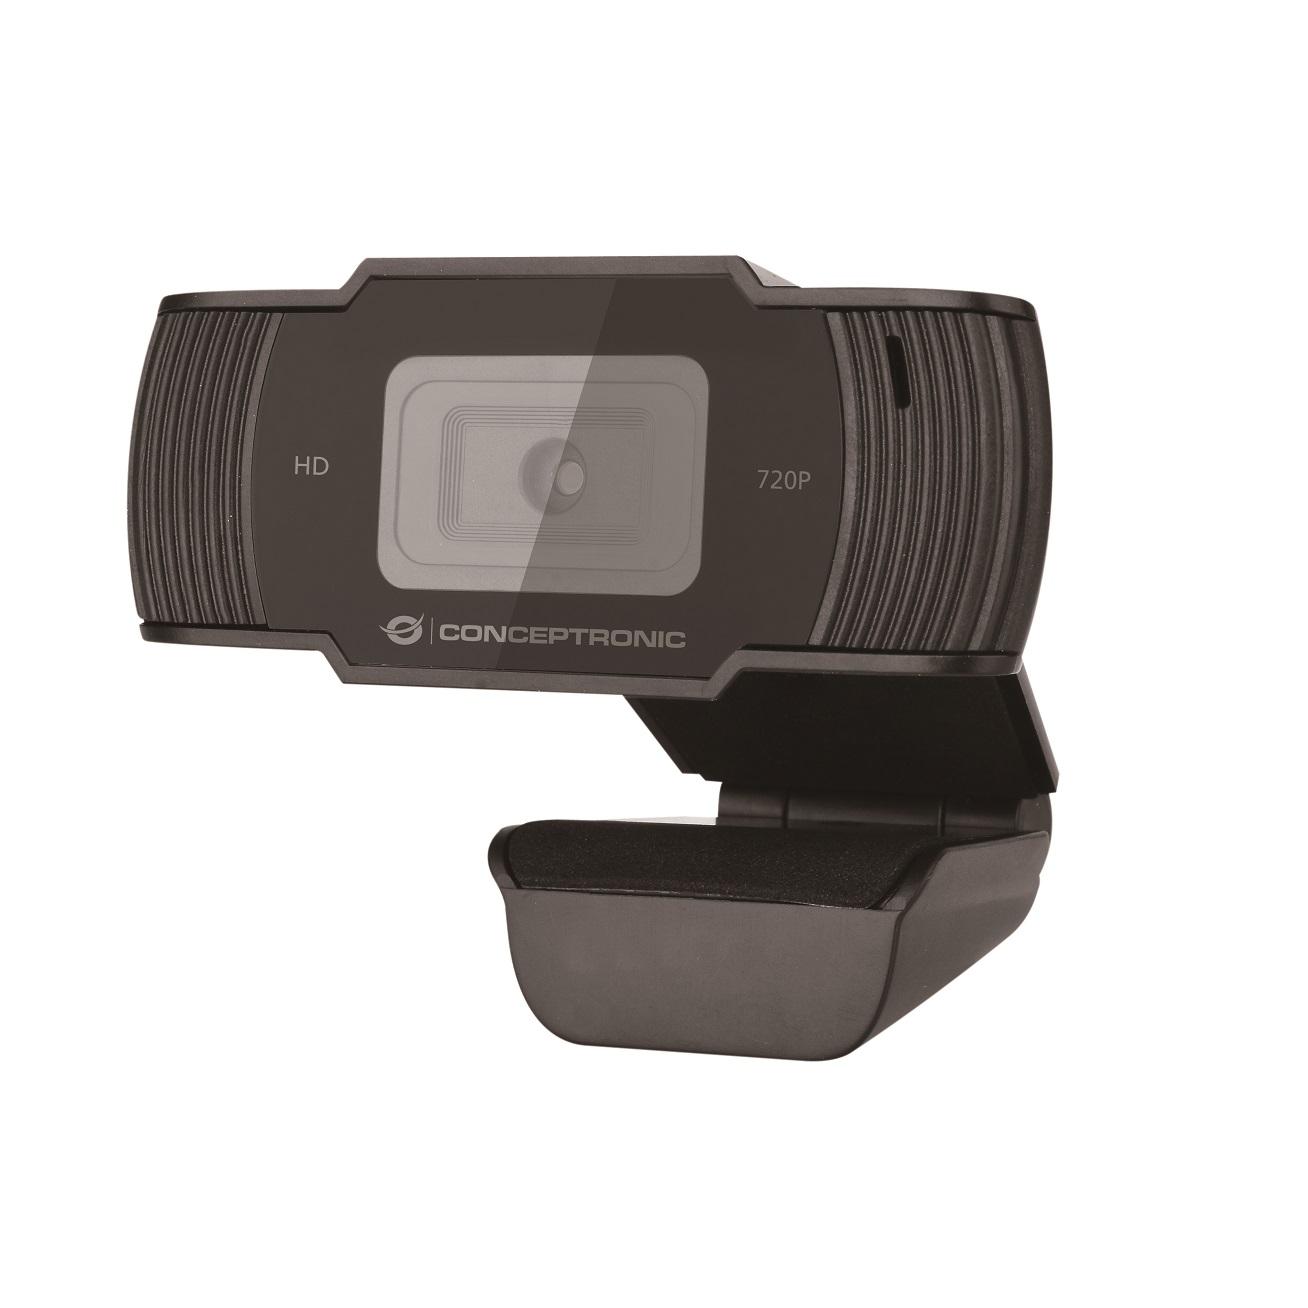 Webcam hd conceptronic amdis05b - 720p - usb 2.0 - 30 fps - angulo vision 68º - microfono integrado